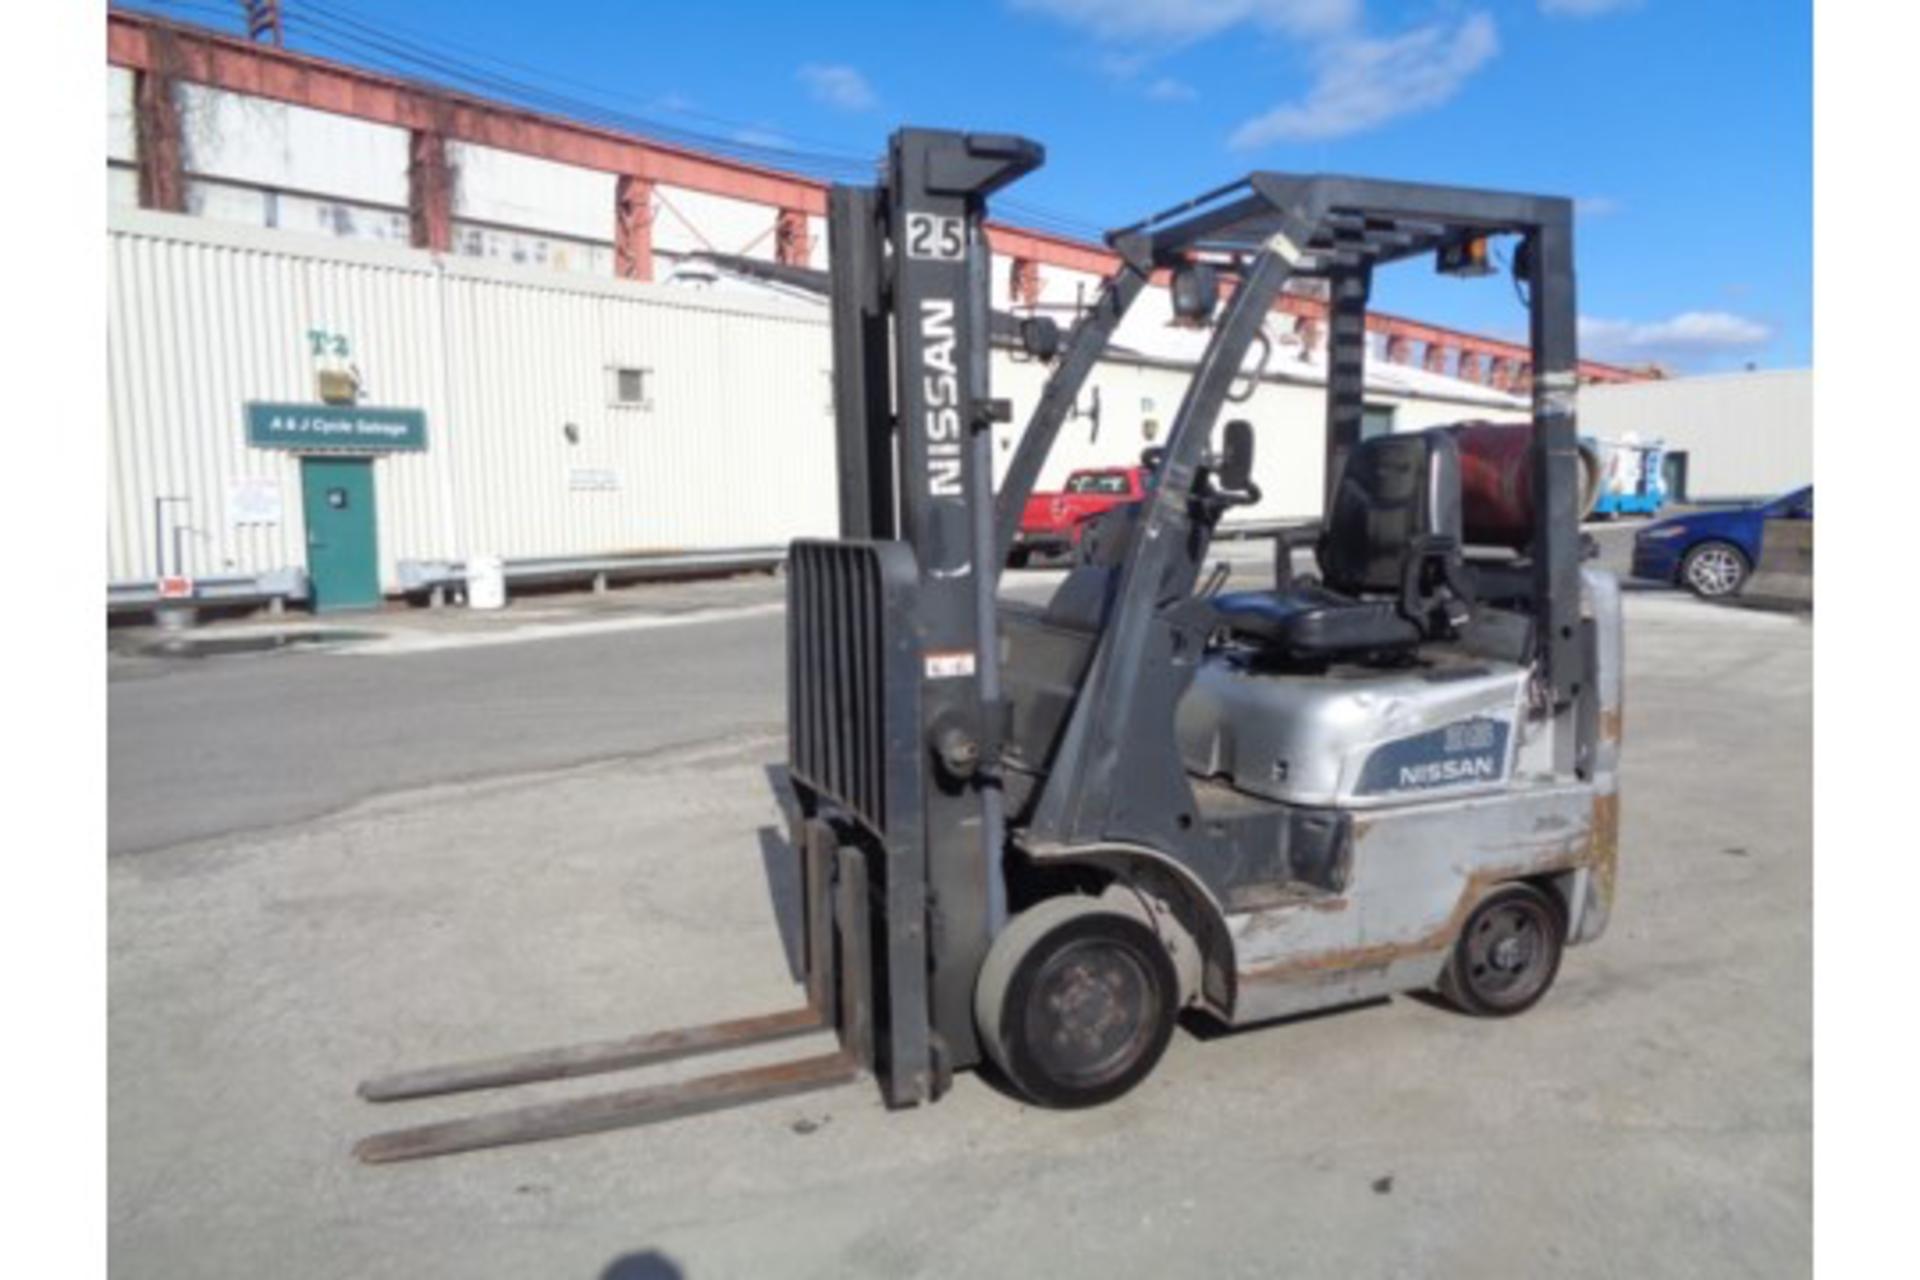 Nissan MCPL01A18LV 3500lb Forklift - Image 7 of 16